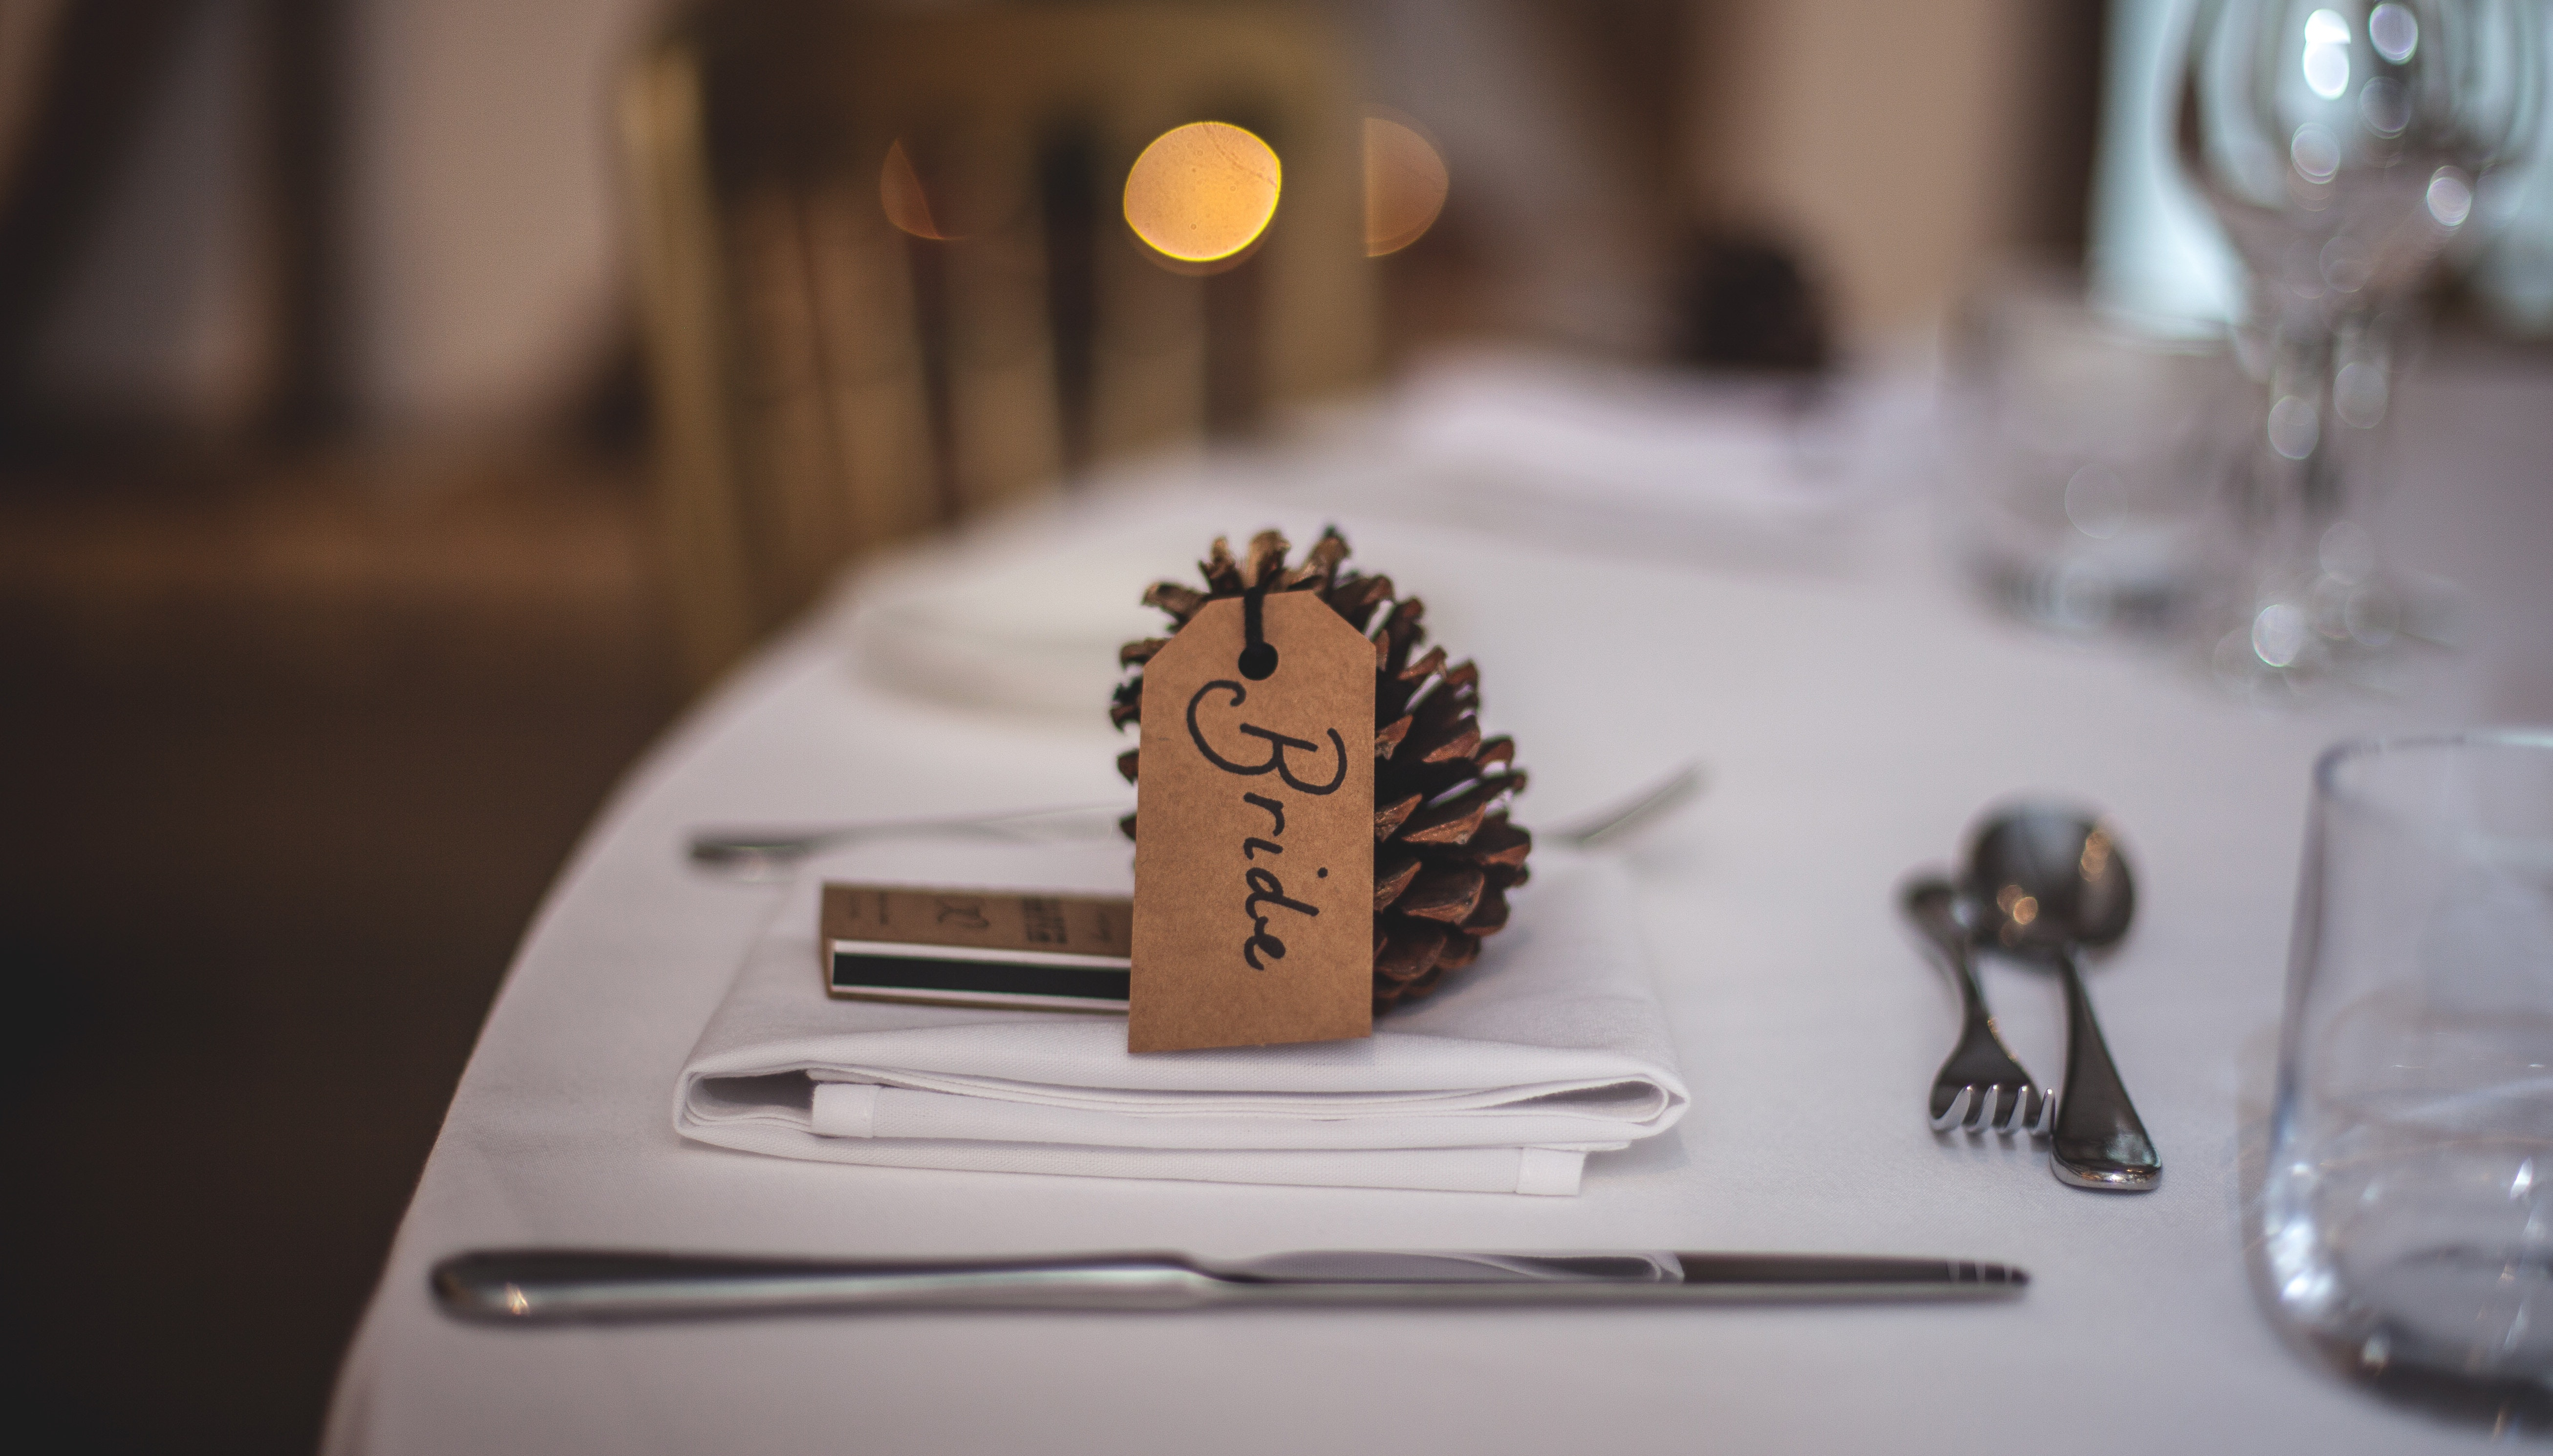 acorn-blur-cutlery-175765.jpg